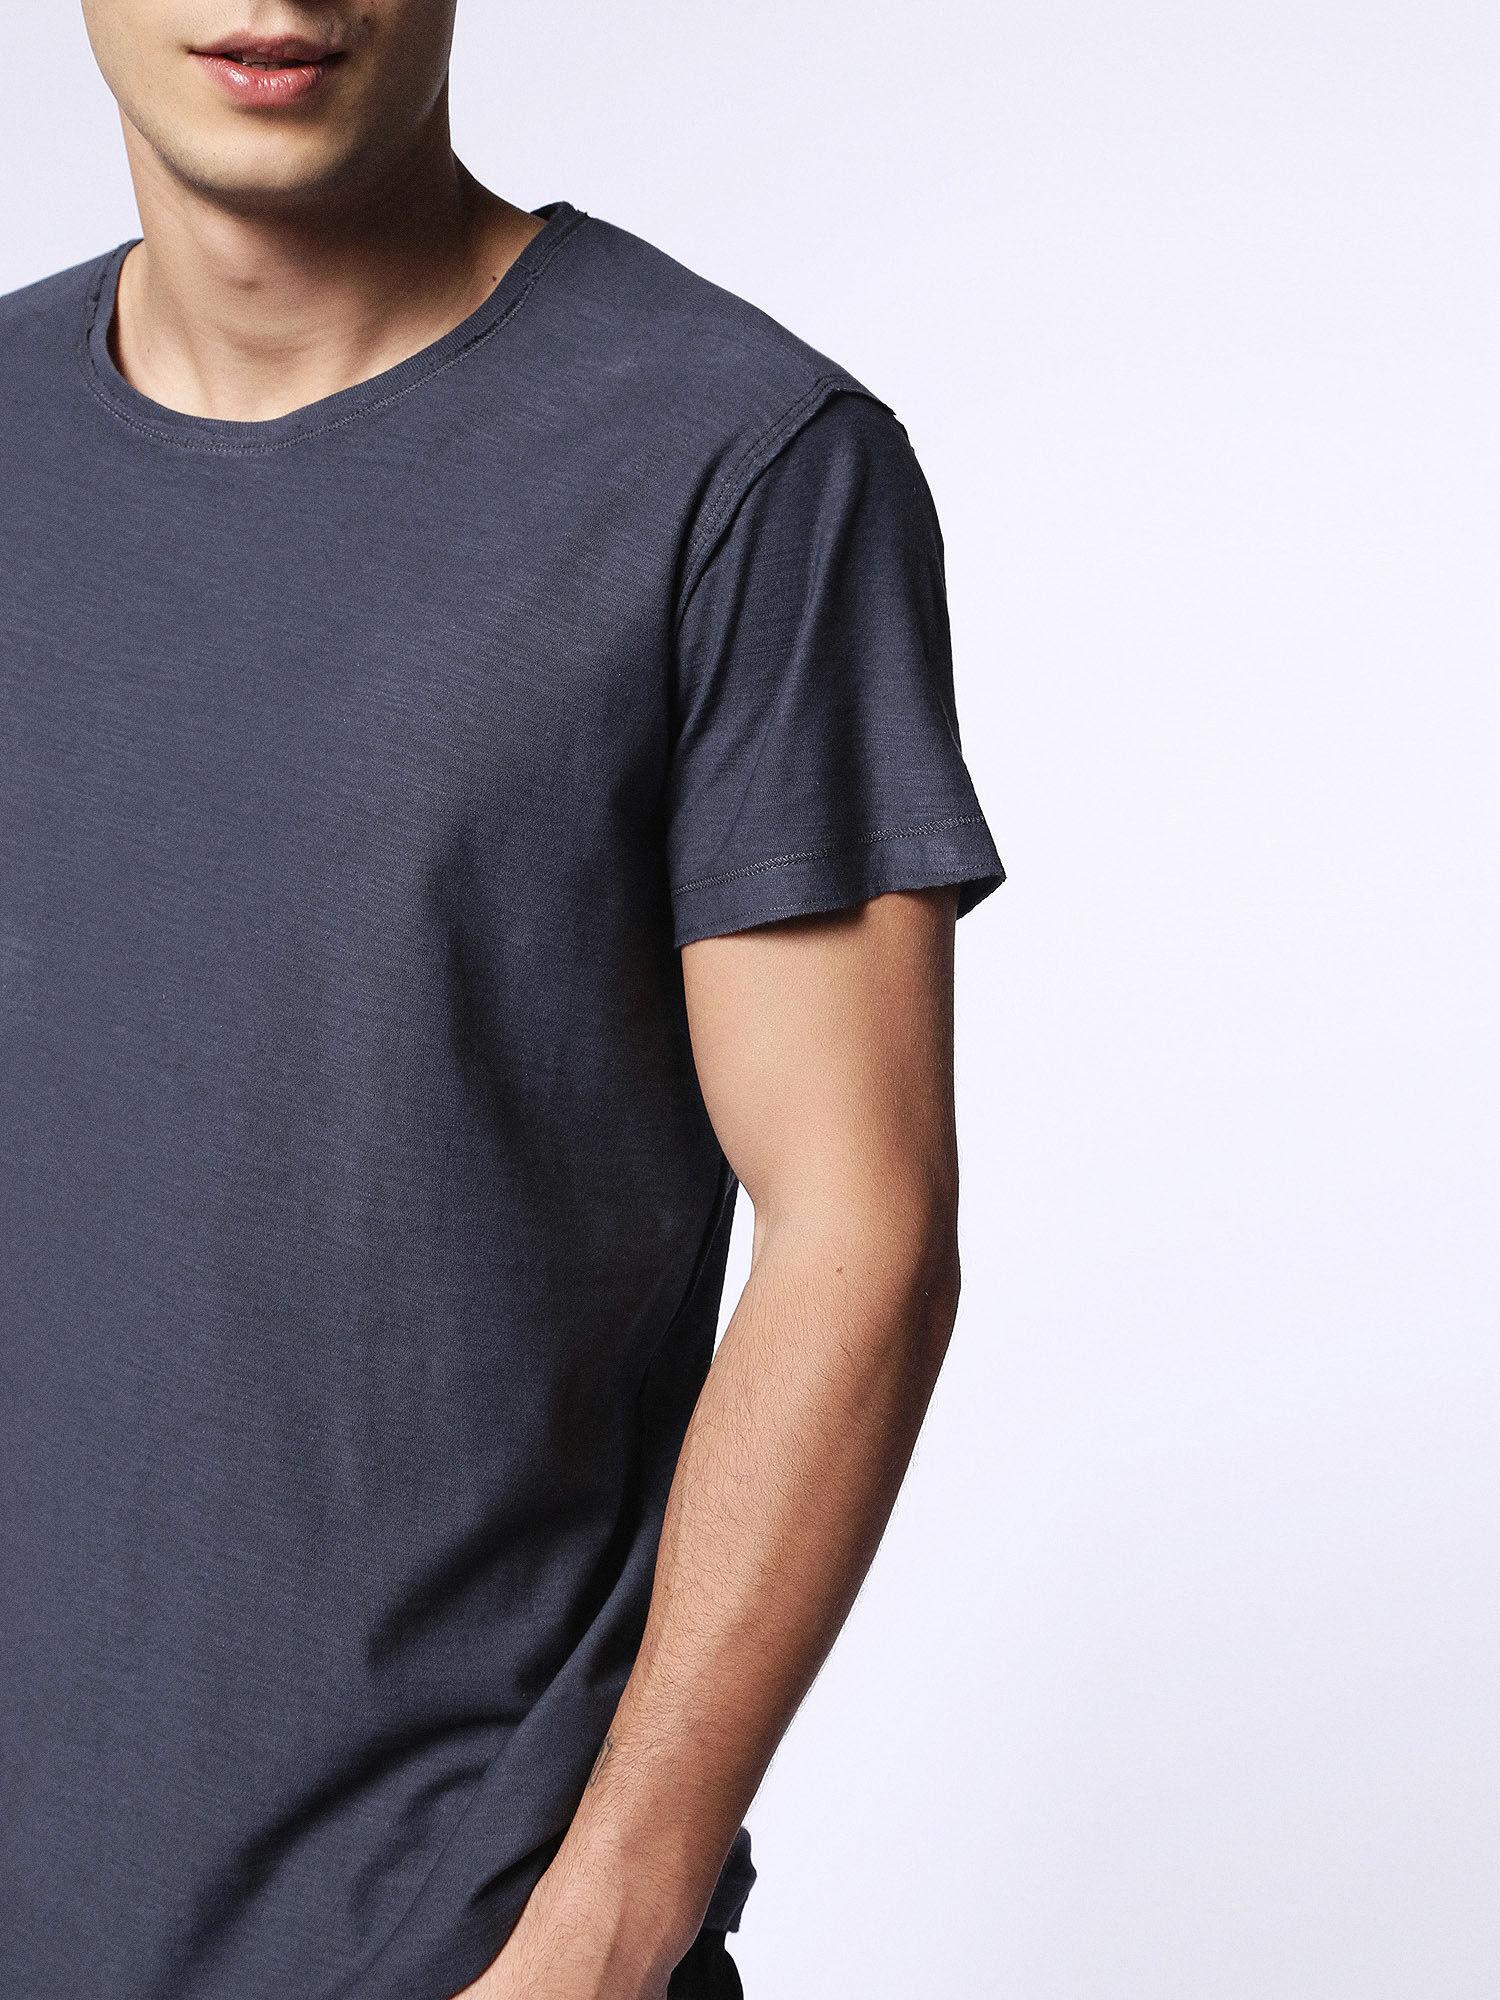 00SRFL00KDY T-Shirts Man T-KNAK by Diesel Blue